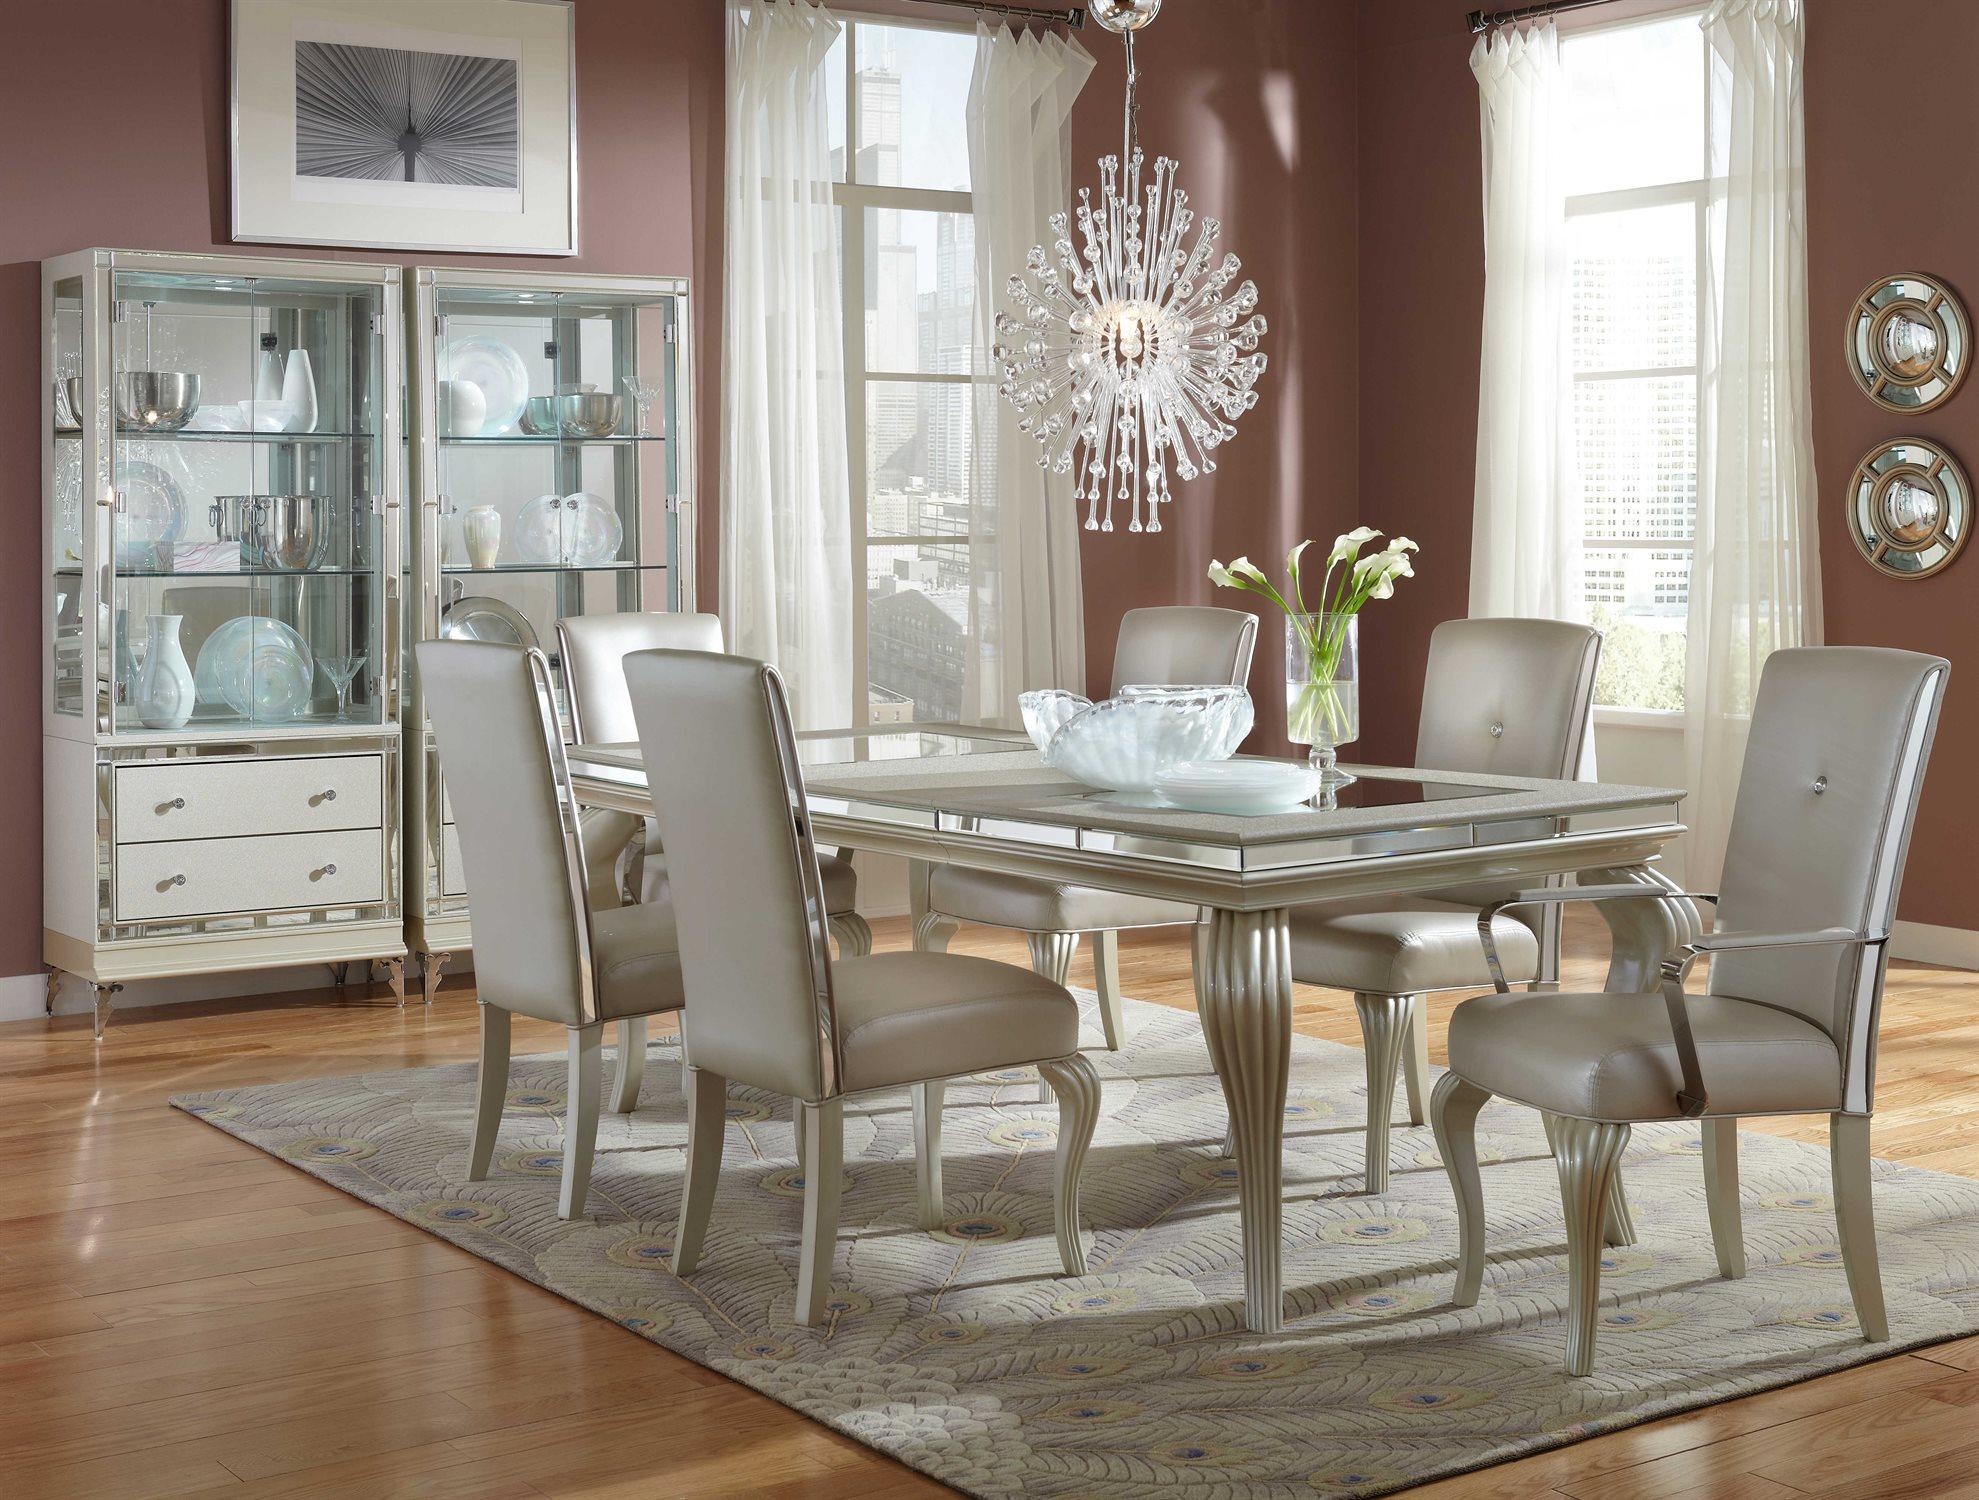 Aico Furniture Hollywood Loft Dining Room Set Aic9001600104set